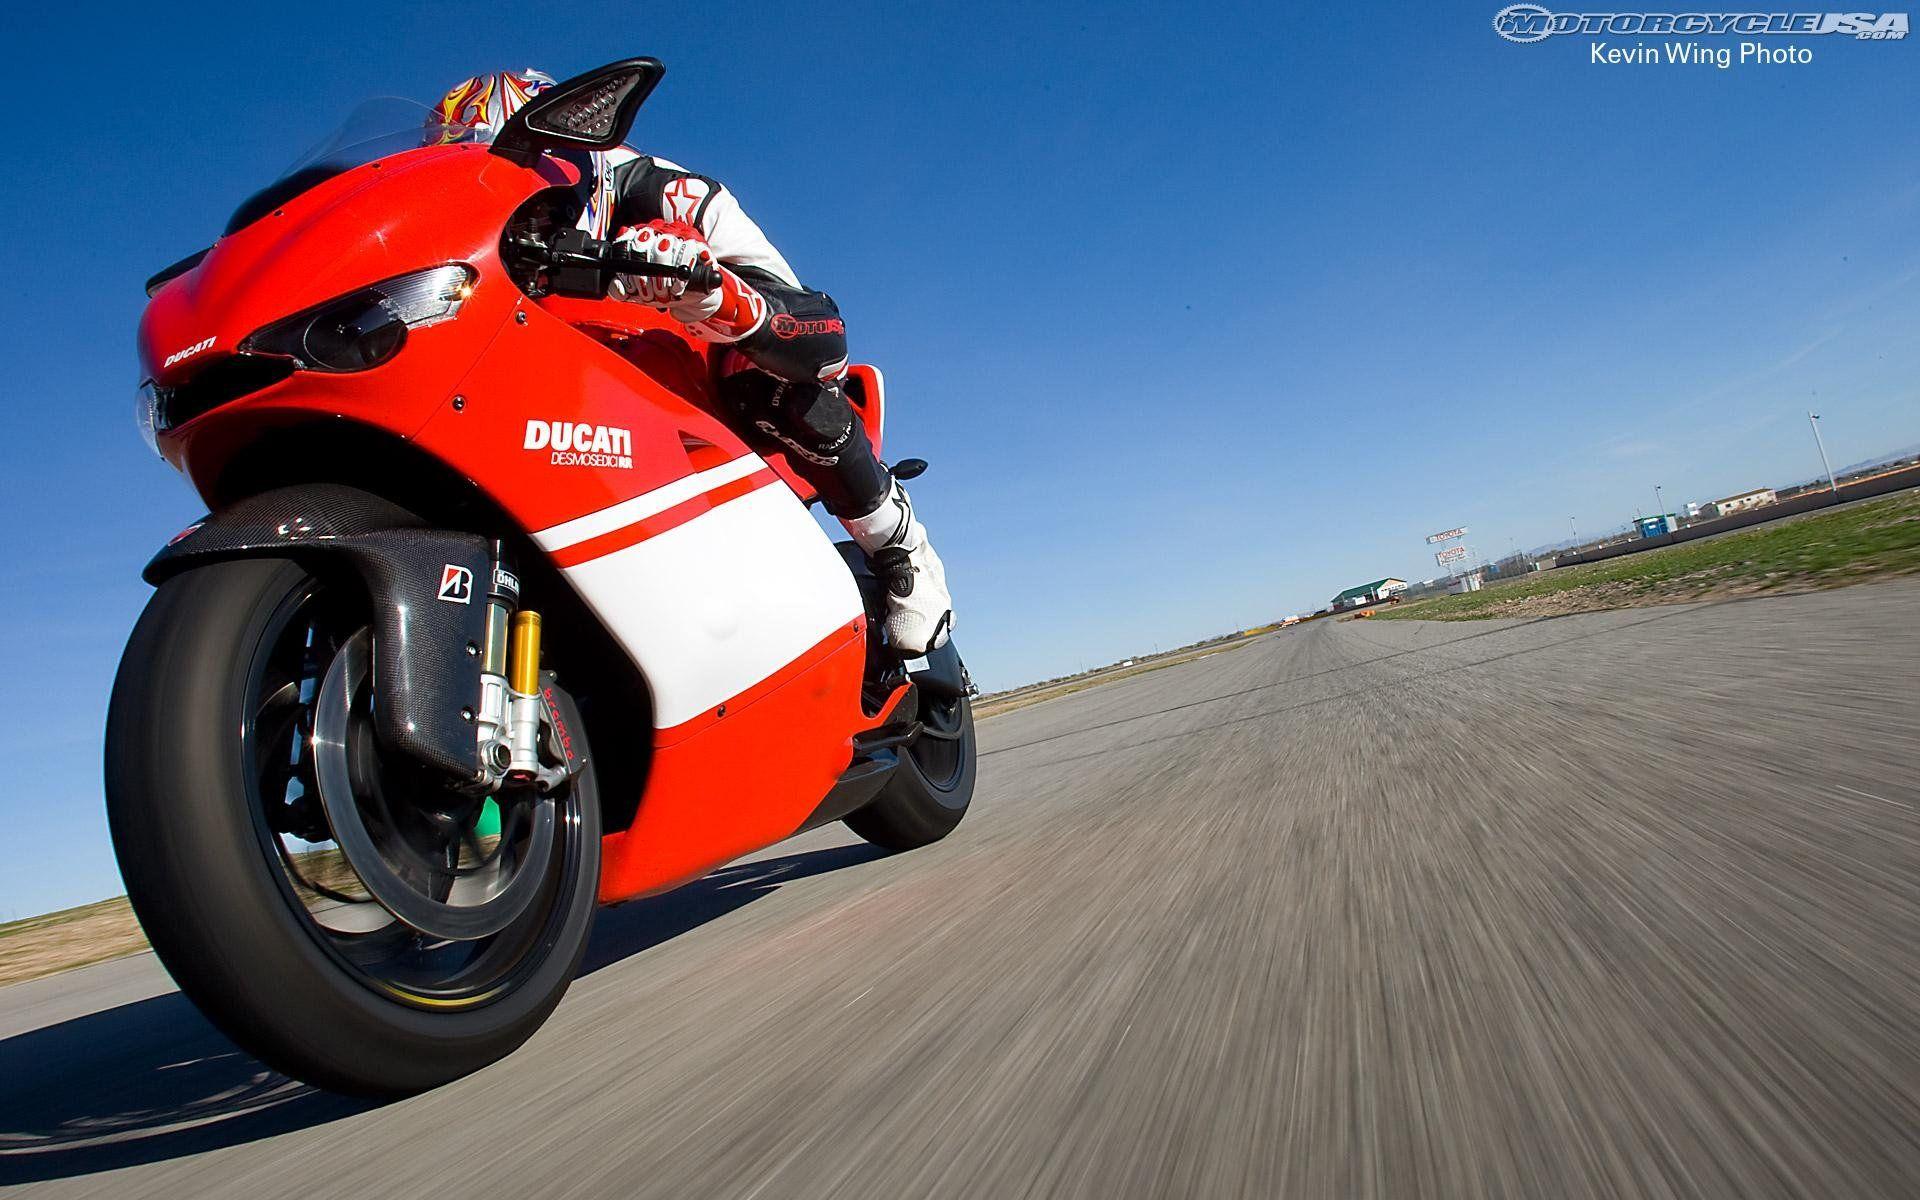 Ducati Desmosedici Rr Wallpapers Wide In 2020 Ducati Desmosedici Rr Ducati Desmo Ducati